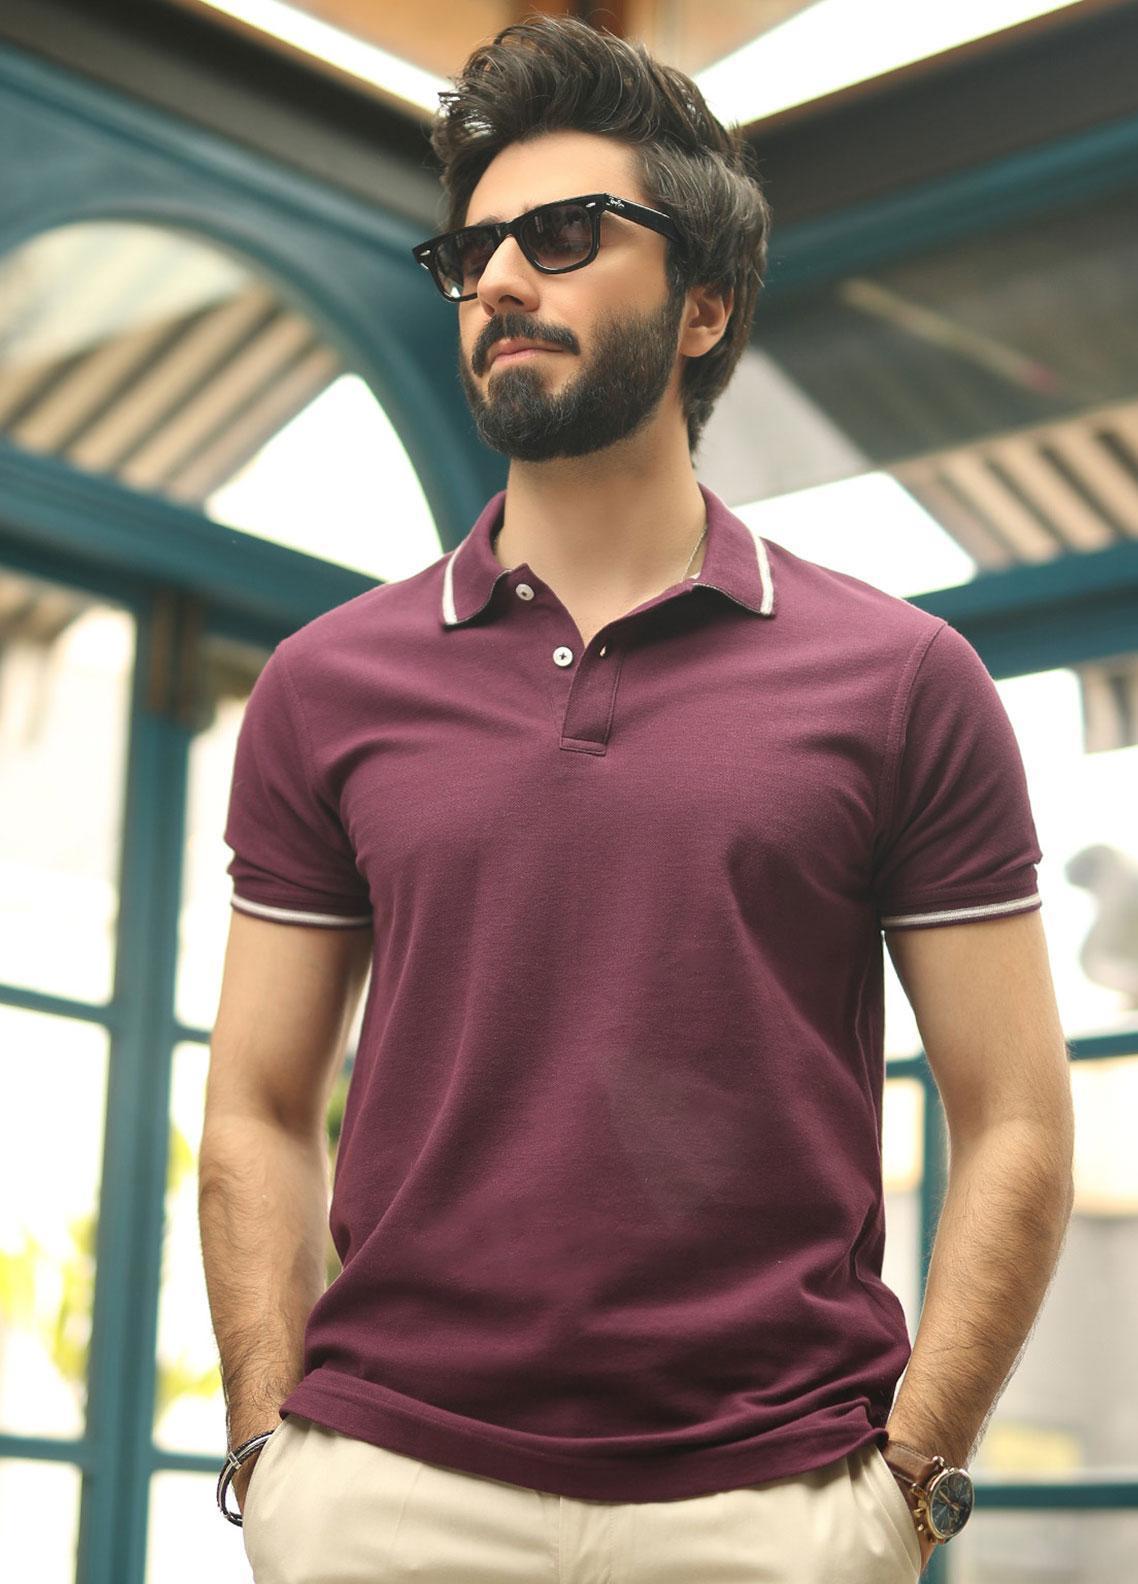 Edenrobe Cotton Polo Shirts for Men - Plum EMTPS19-021